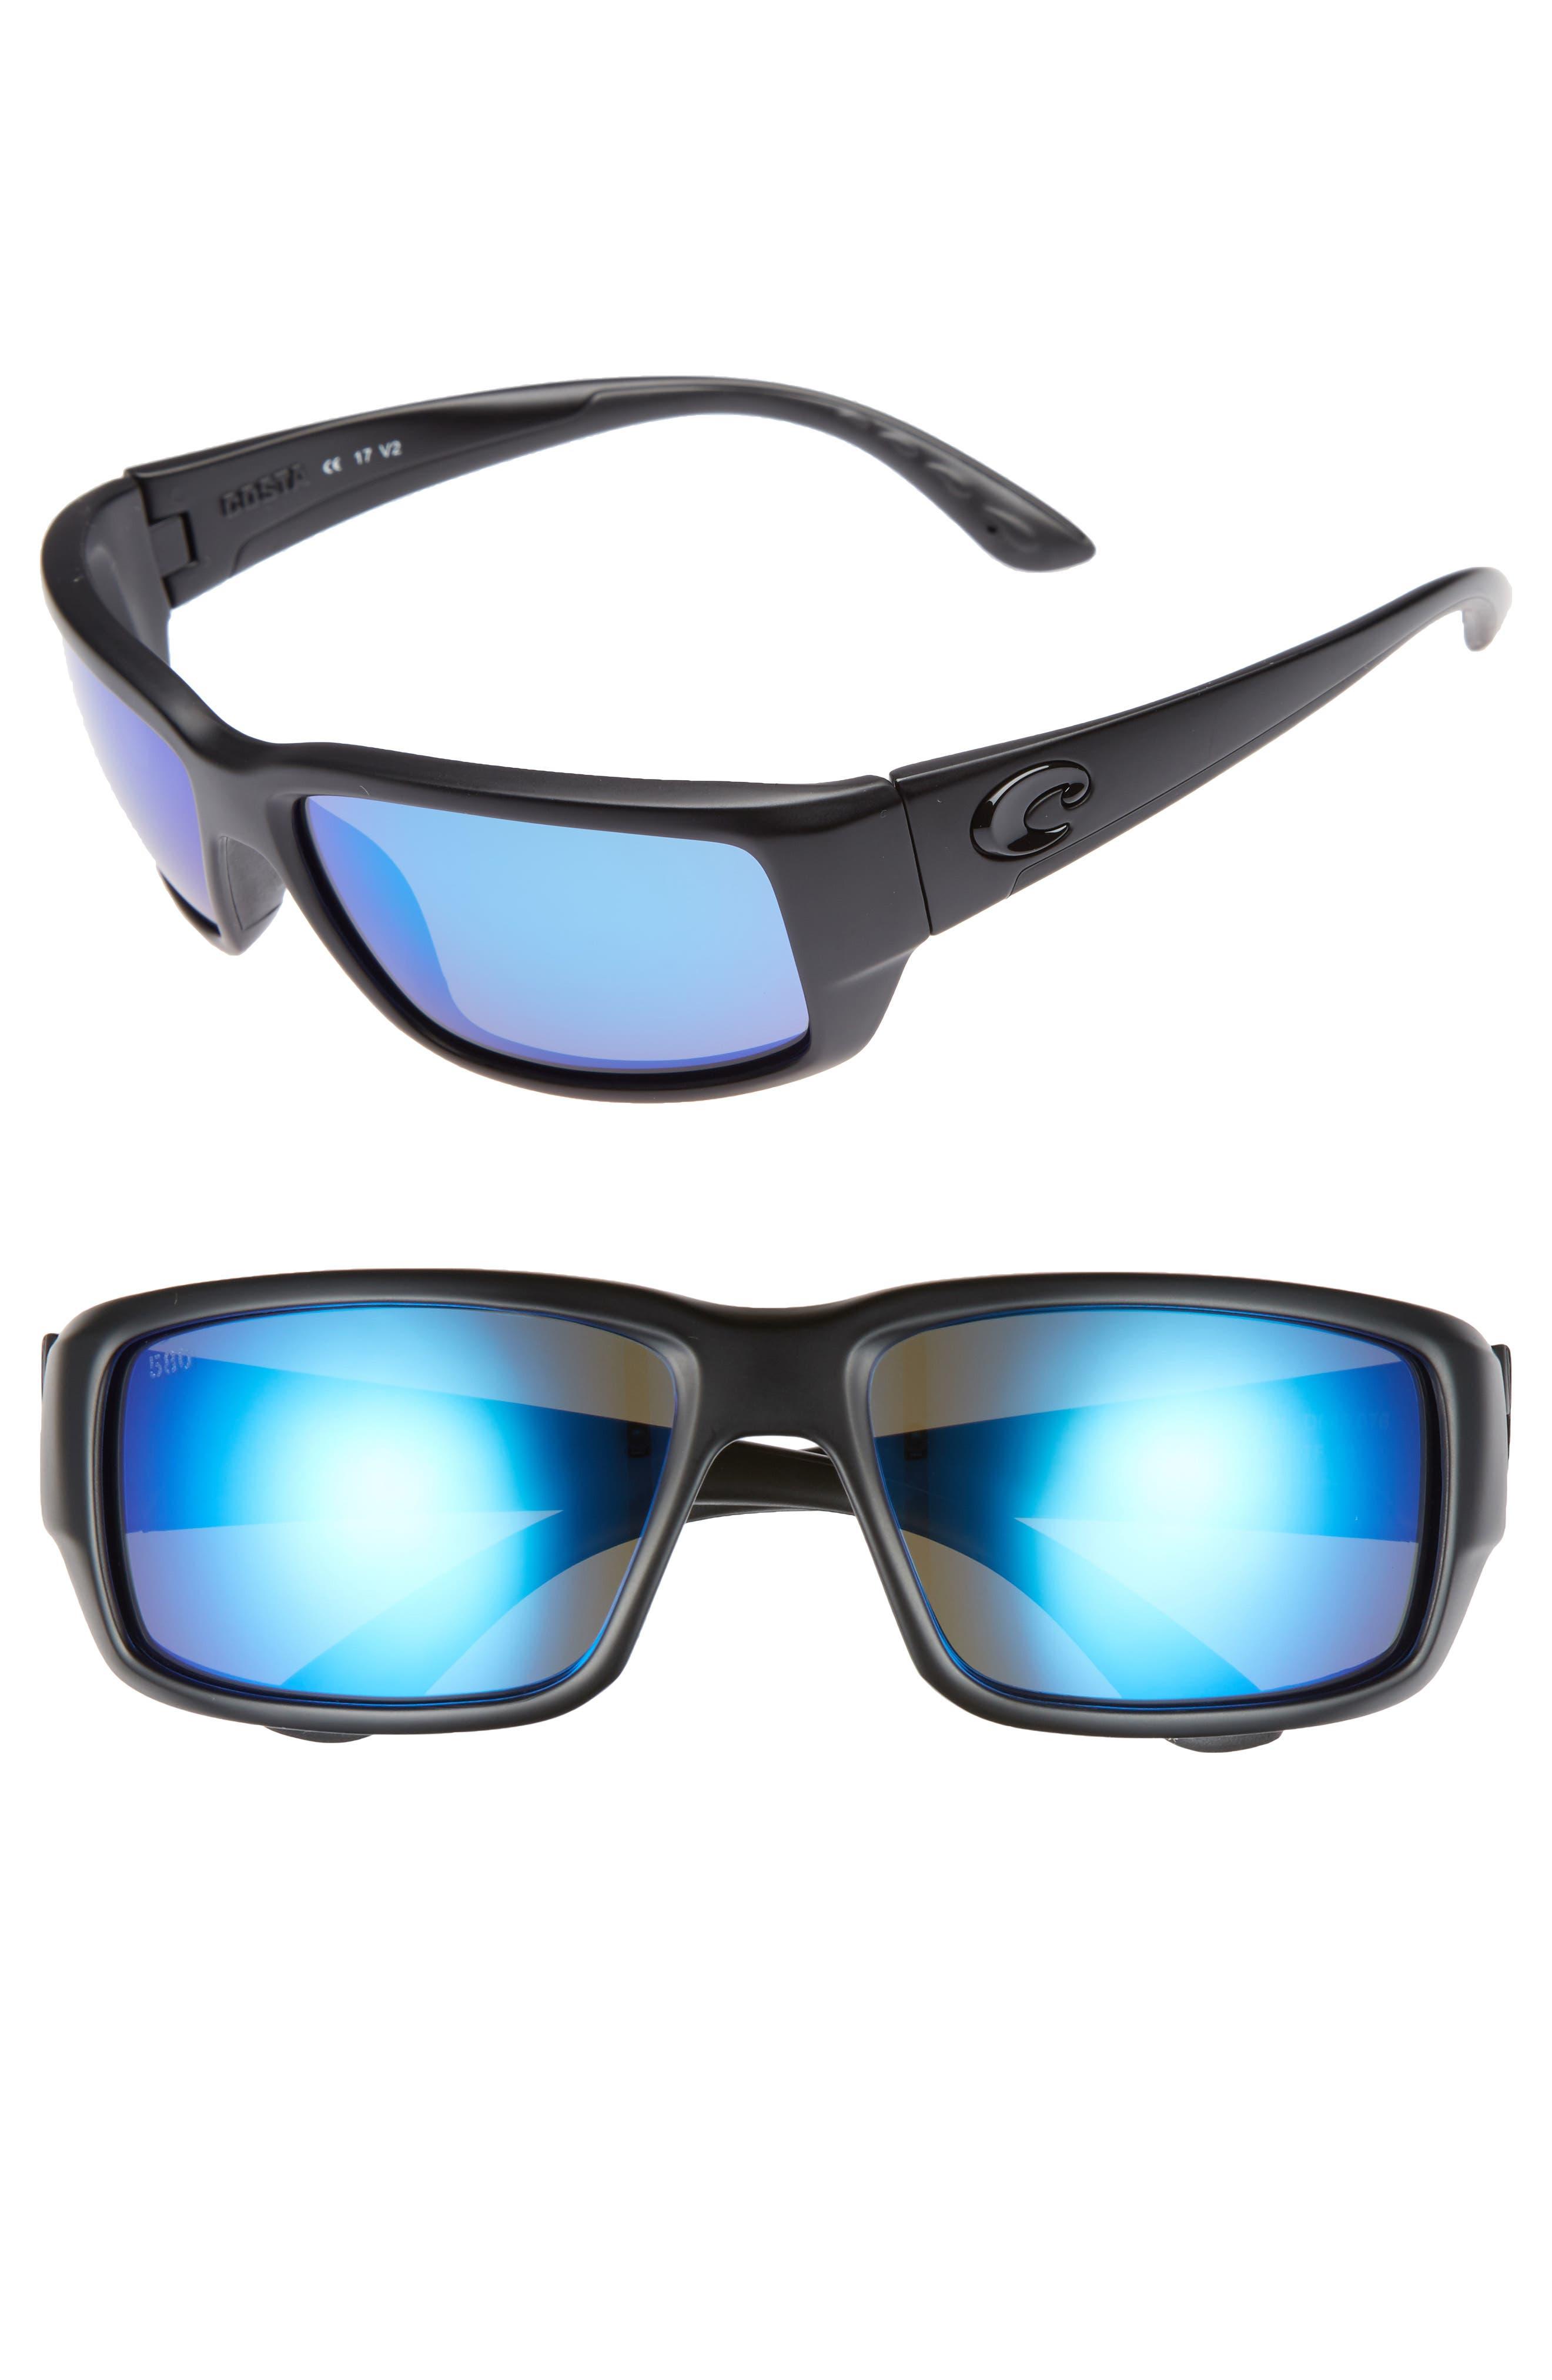 Fantail 60mm Polarized Sunglasses,                         Main,                         color, BLACKOUT/ BLUE MIRROR